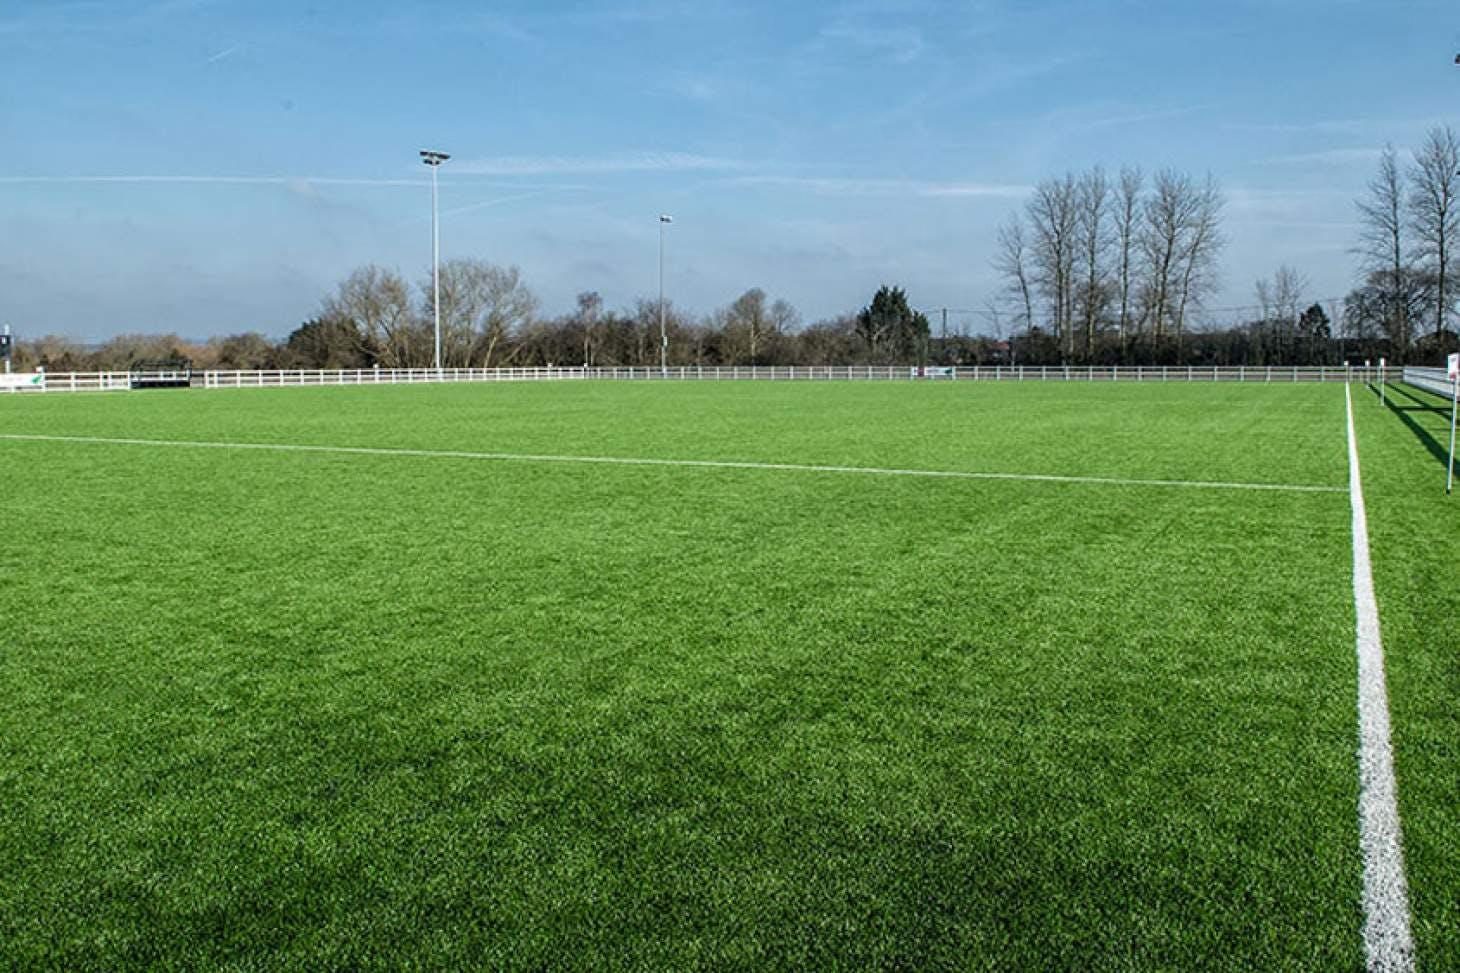 PlayFootball Blaydon 5 a side | 3G Astroturf football pitch